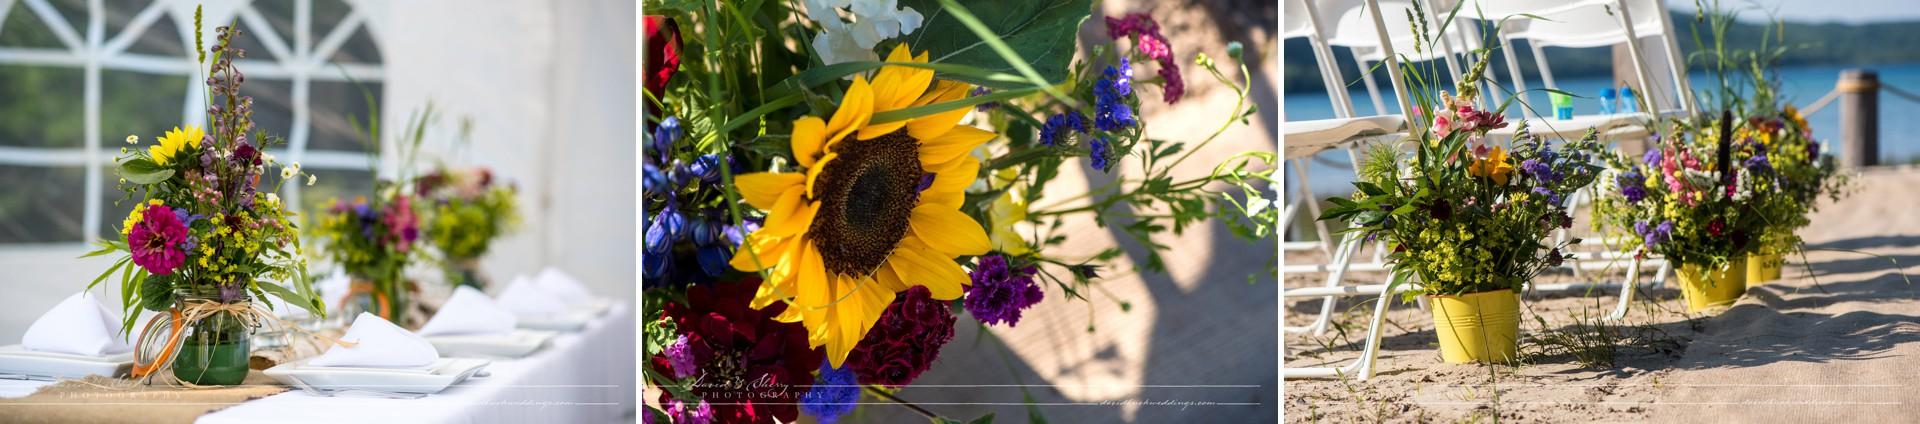 Wiarton_Wedding_Photography_03